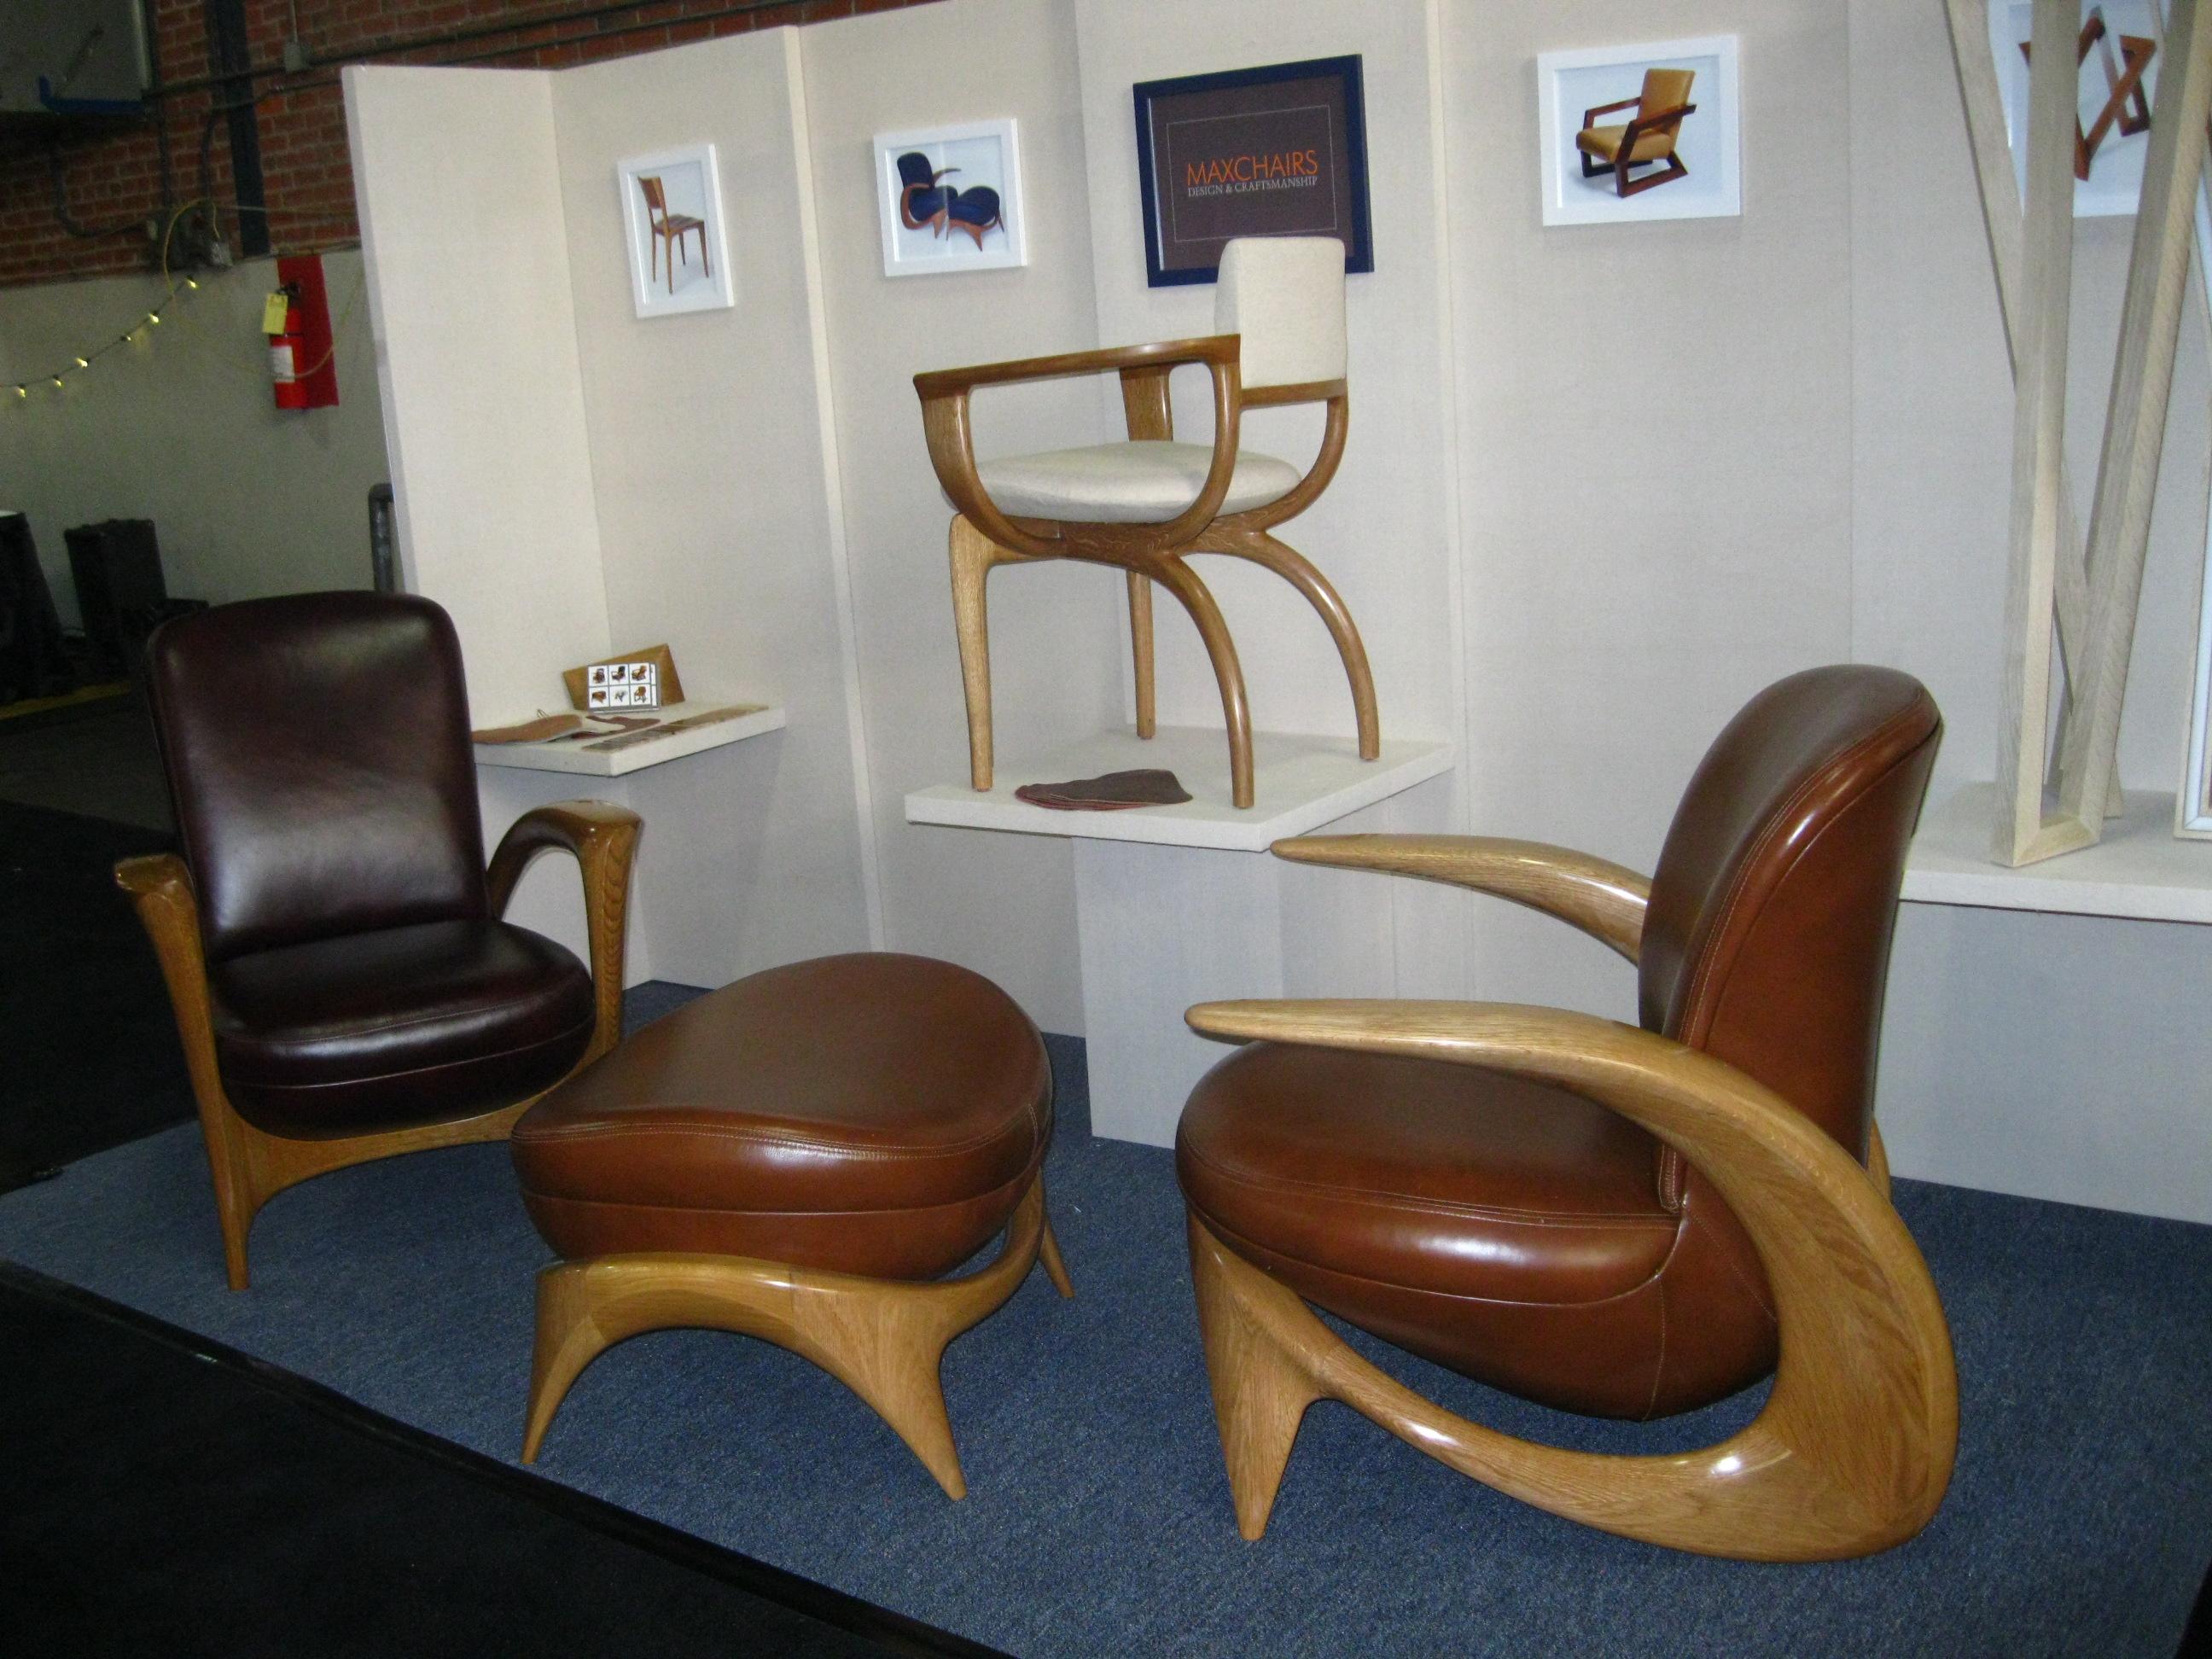 Philadelphia Furniture Show Img 0700 Jpg